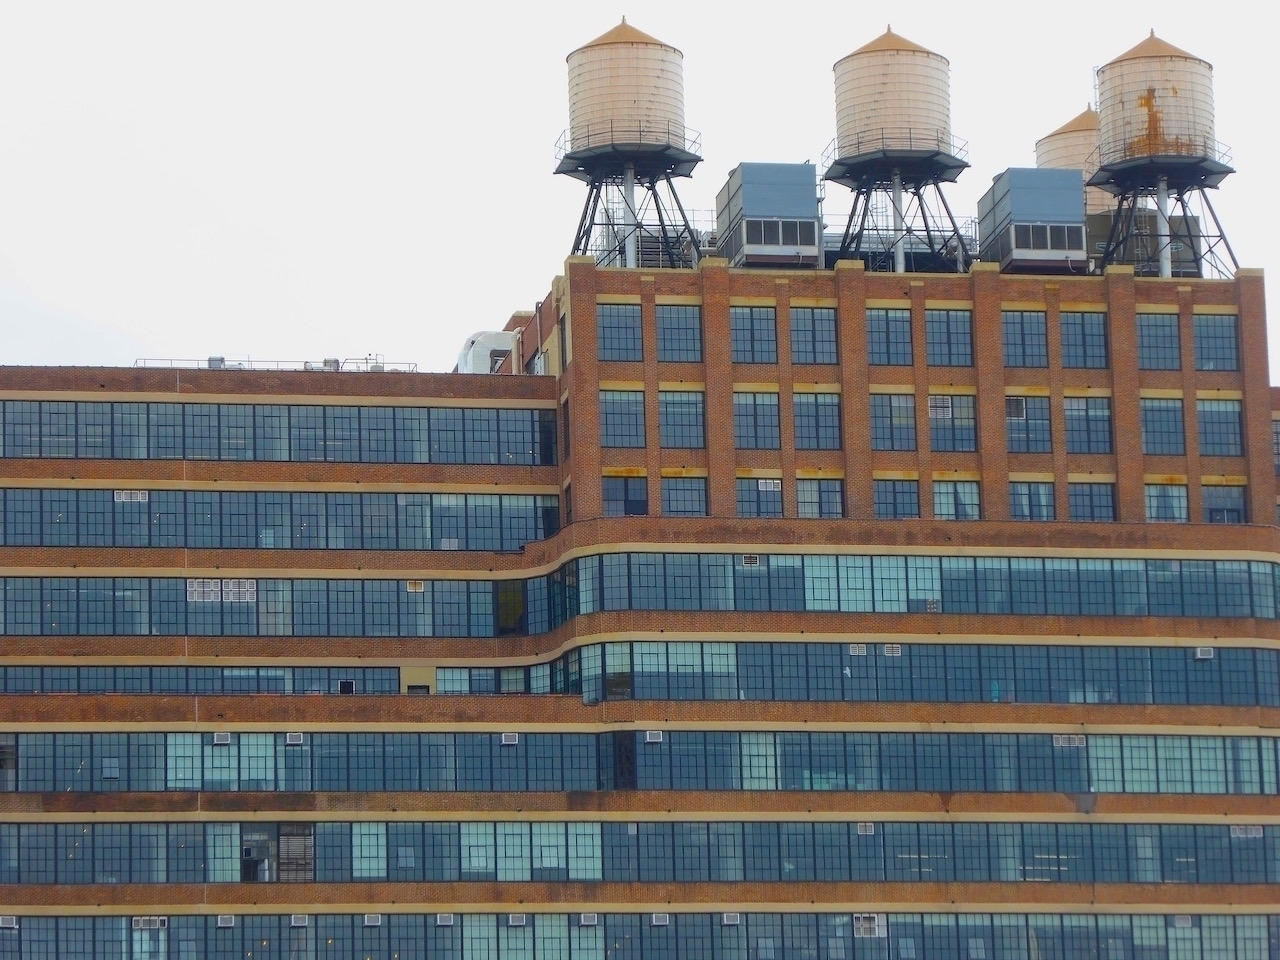 Water Starrett-Lehigh | NYC 201 - thomgollas | ello